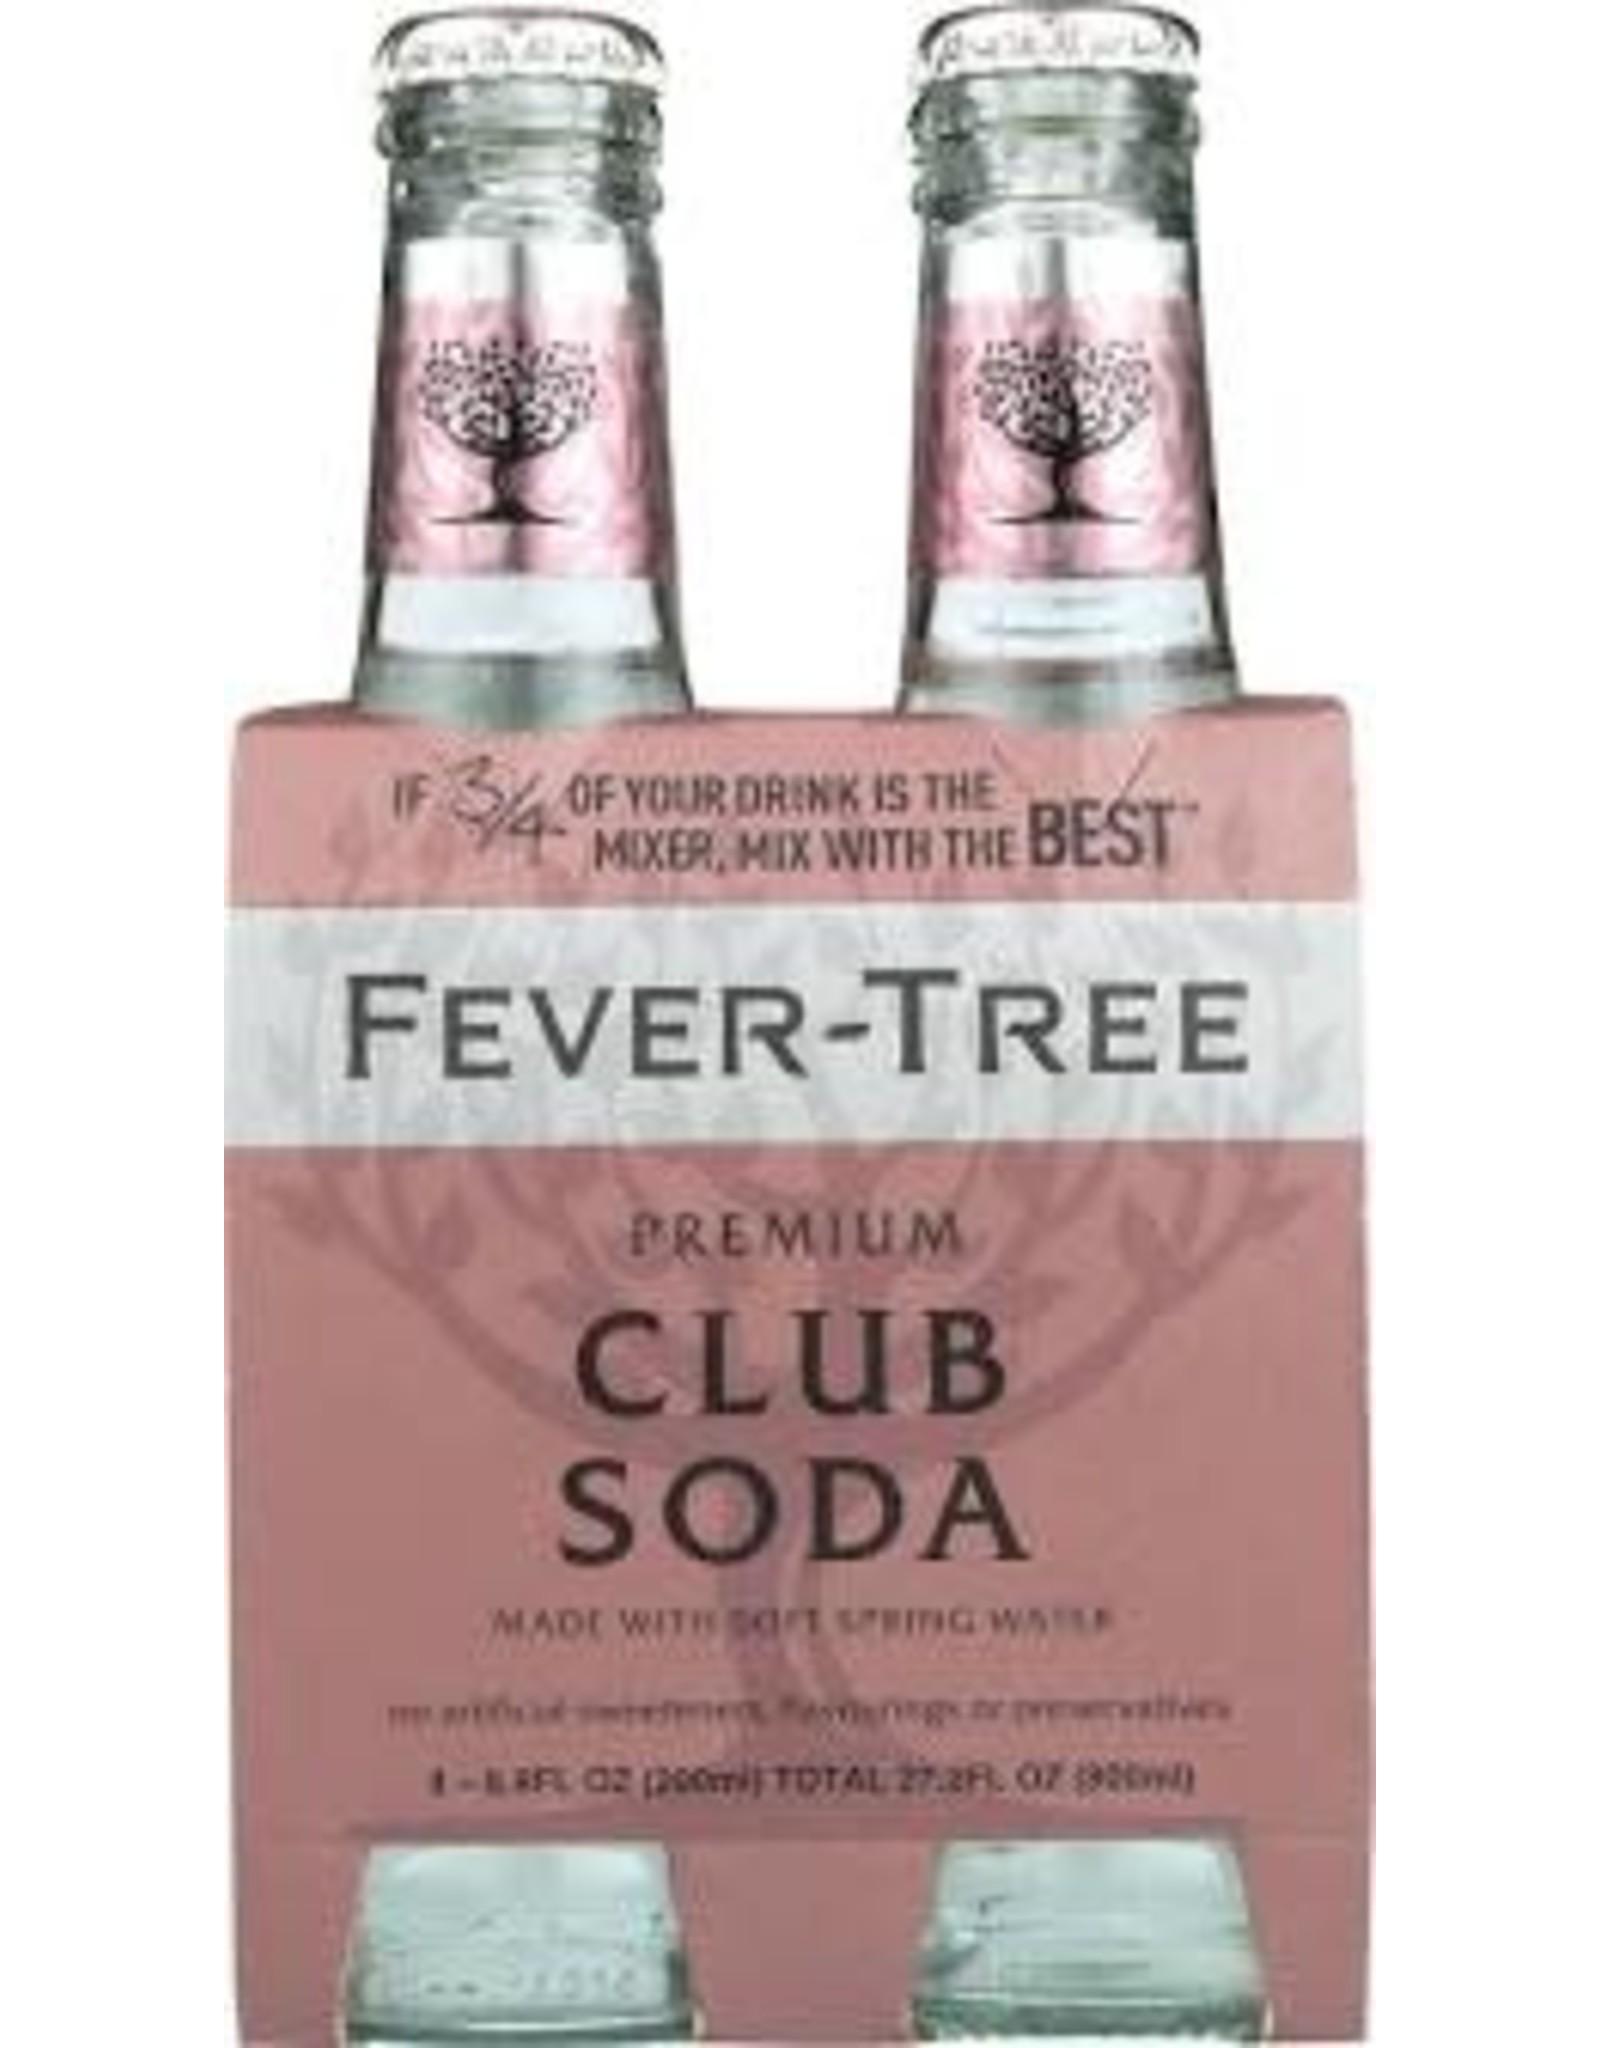 Fever-Tree Fever Tree Club Soda